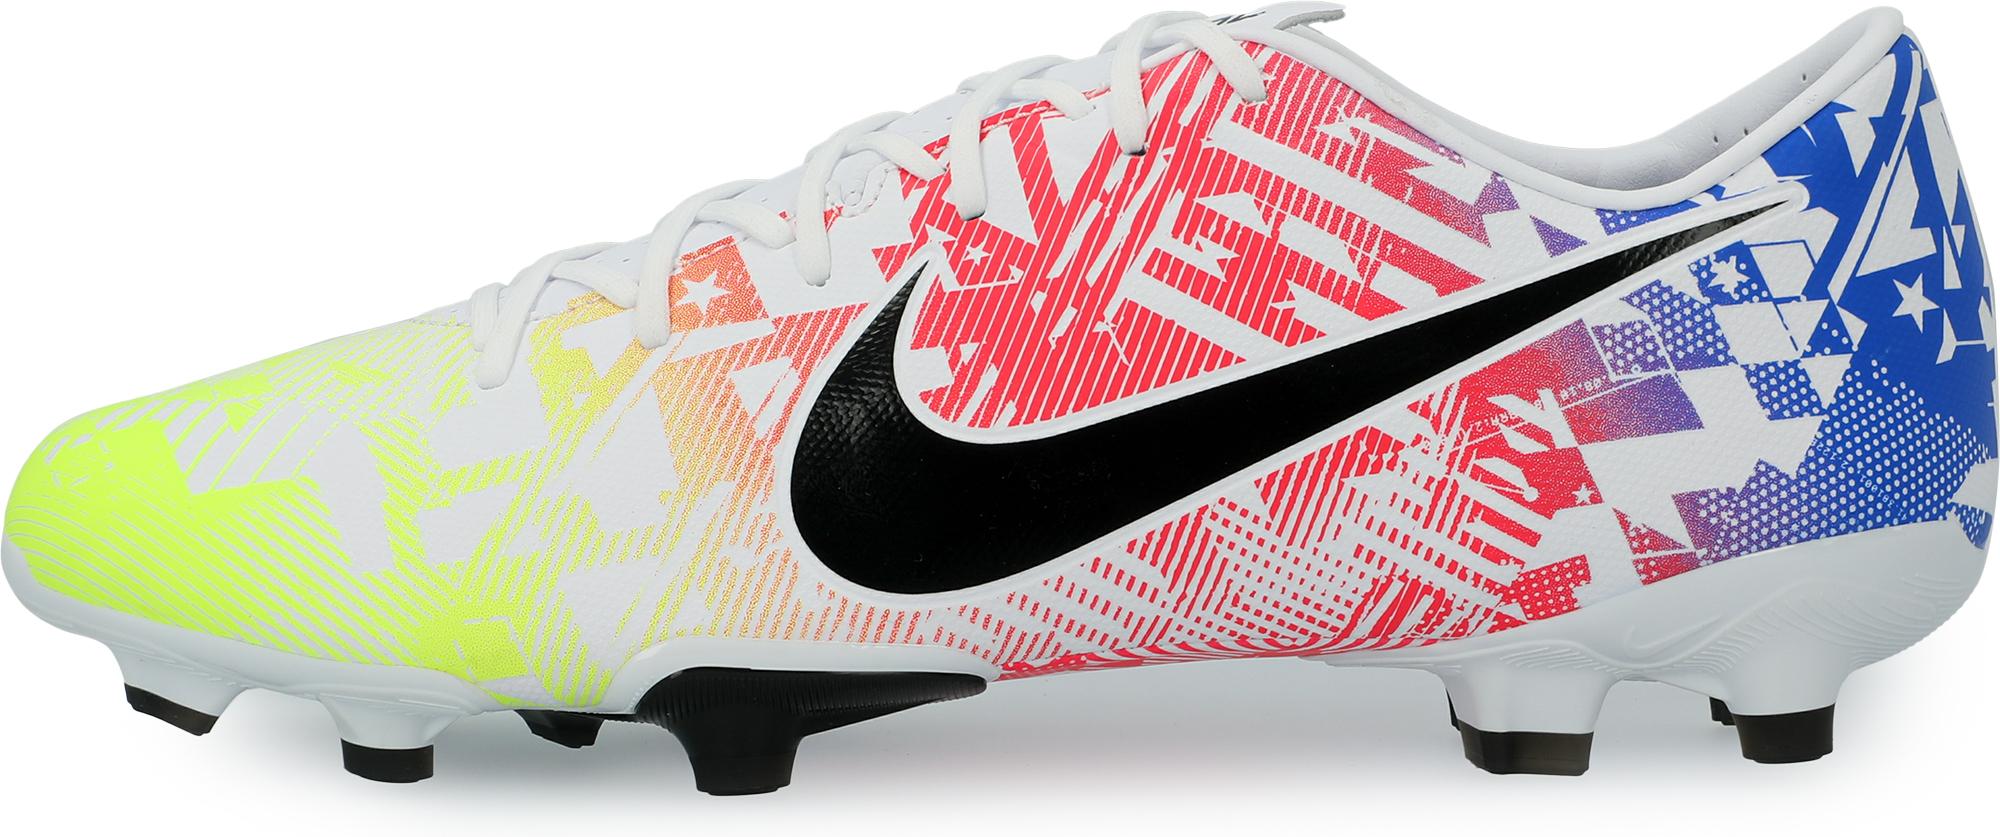 Фото - Nike Бутсы мужские Nike Vapor 13 Academy, размер 41.5 шиповки детские nike vapor 13 academy neymar tf at8144 104